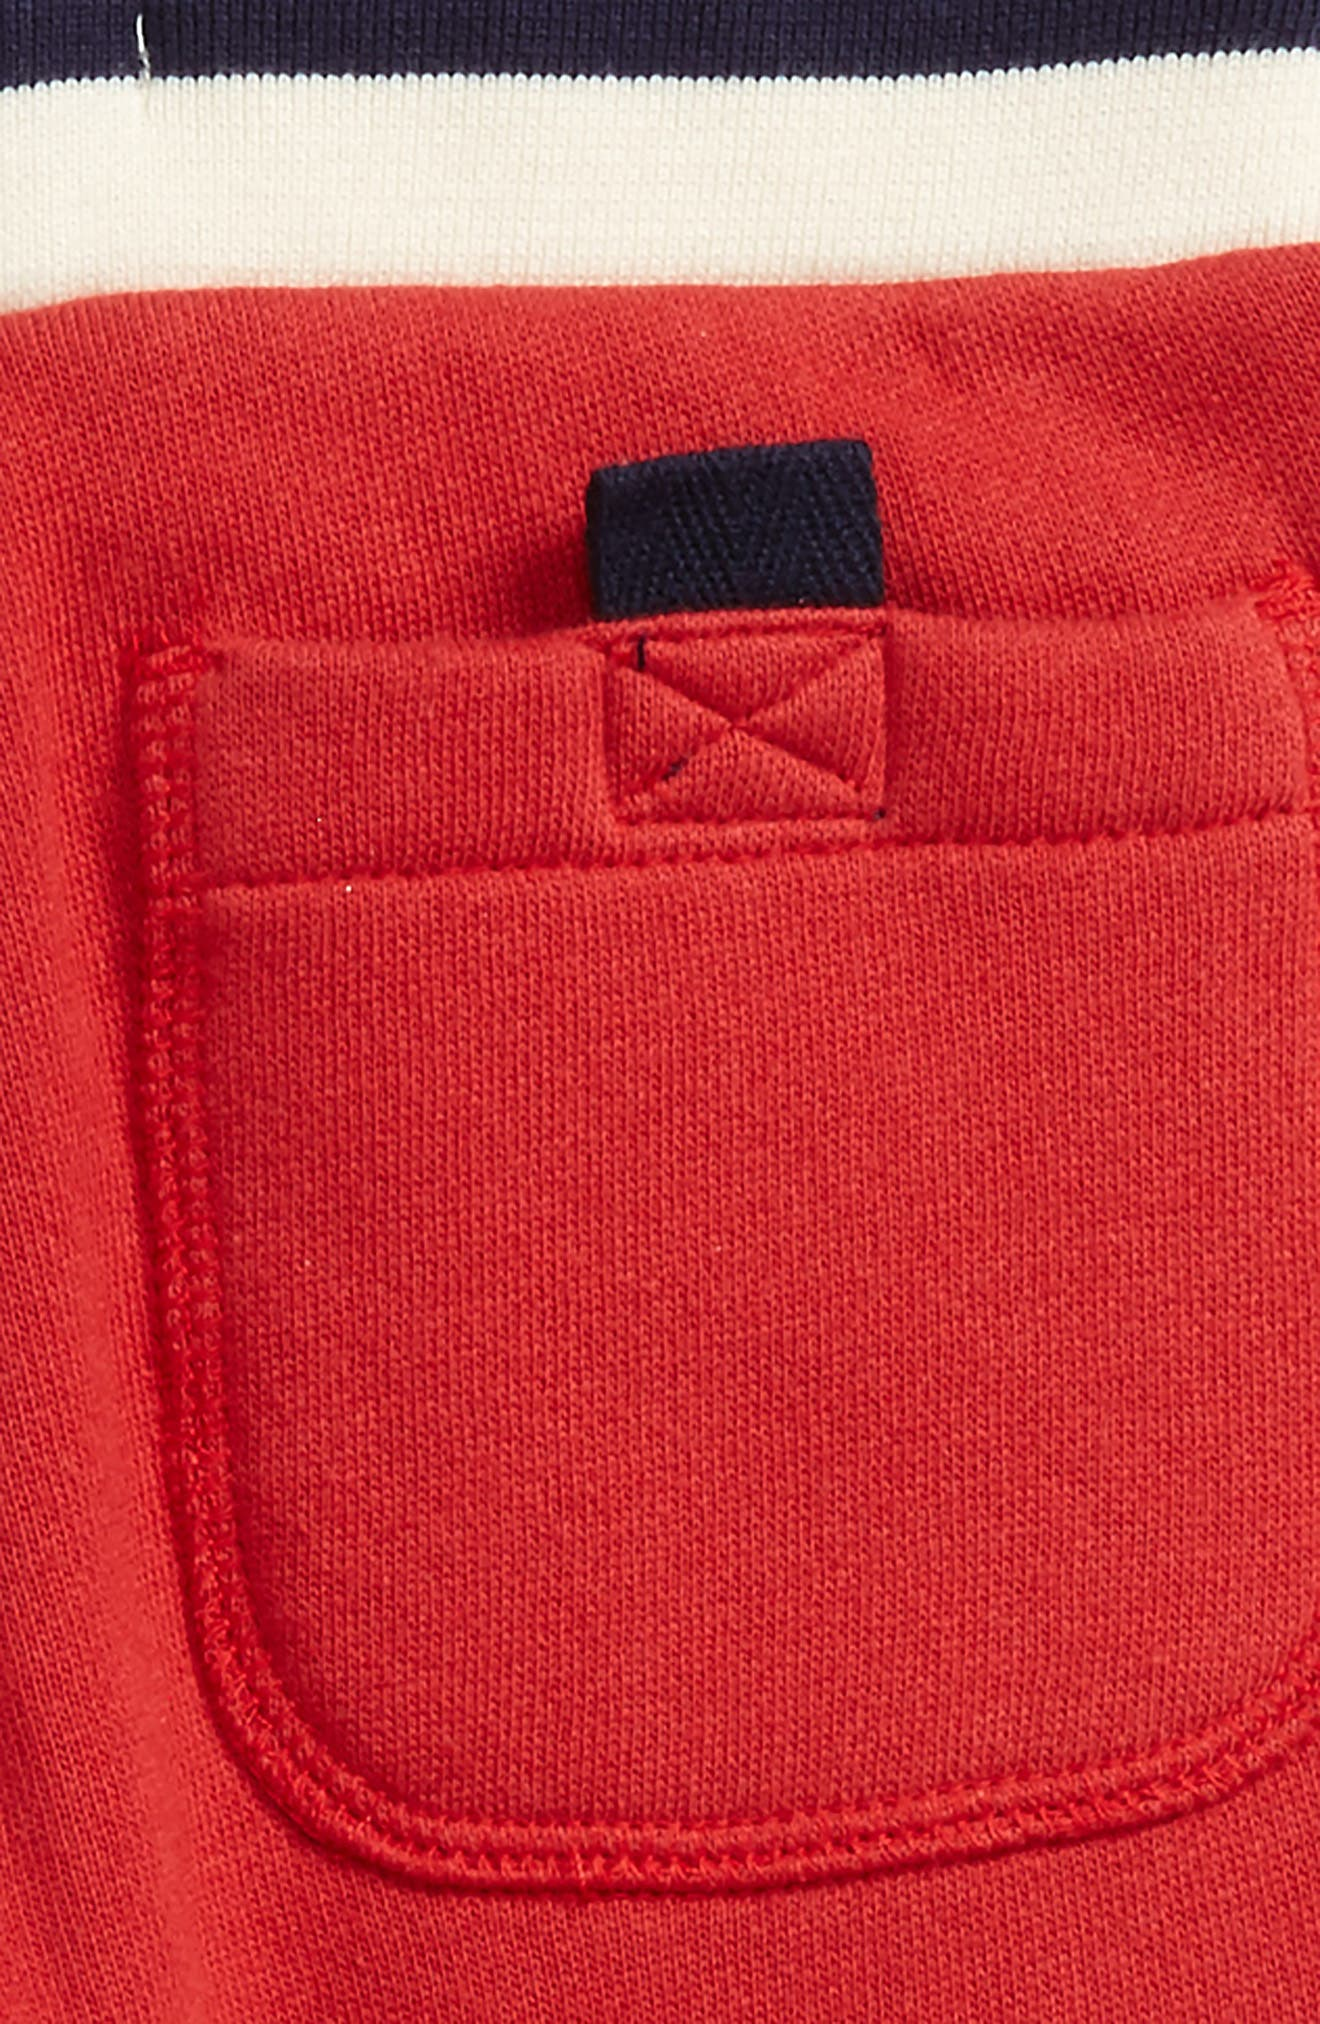 Alternate Image 3  - Mini Boden Everyday Jogger Pants (Toddler Boys, Little Boys & Big Boys)